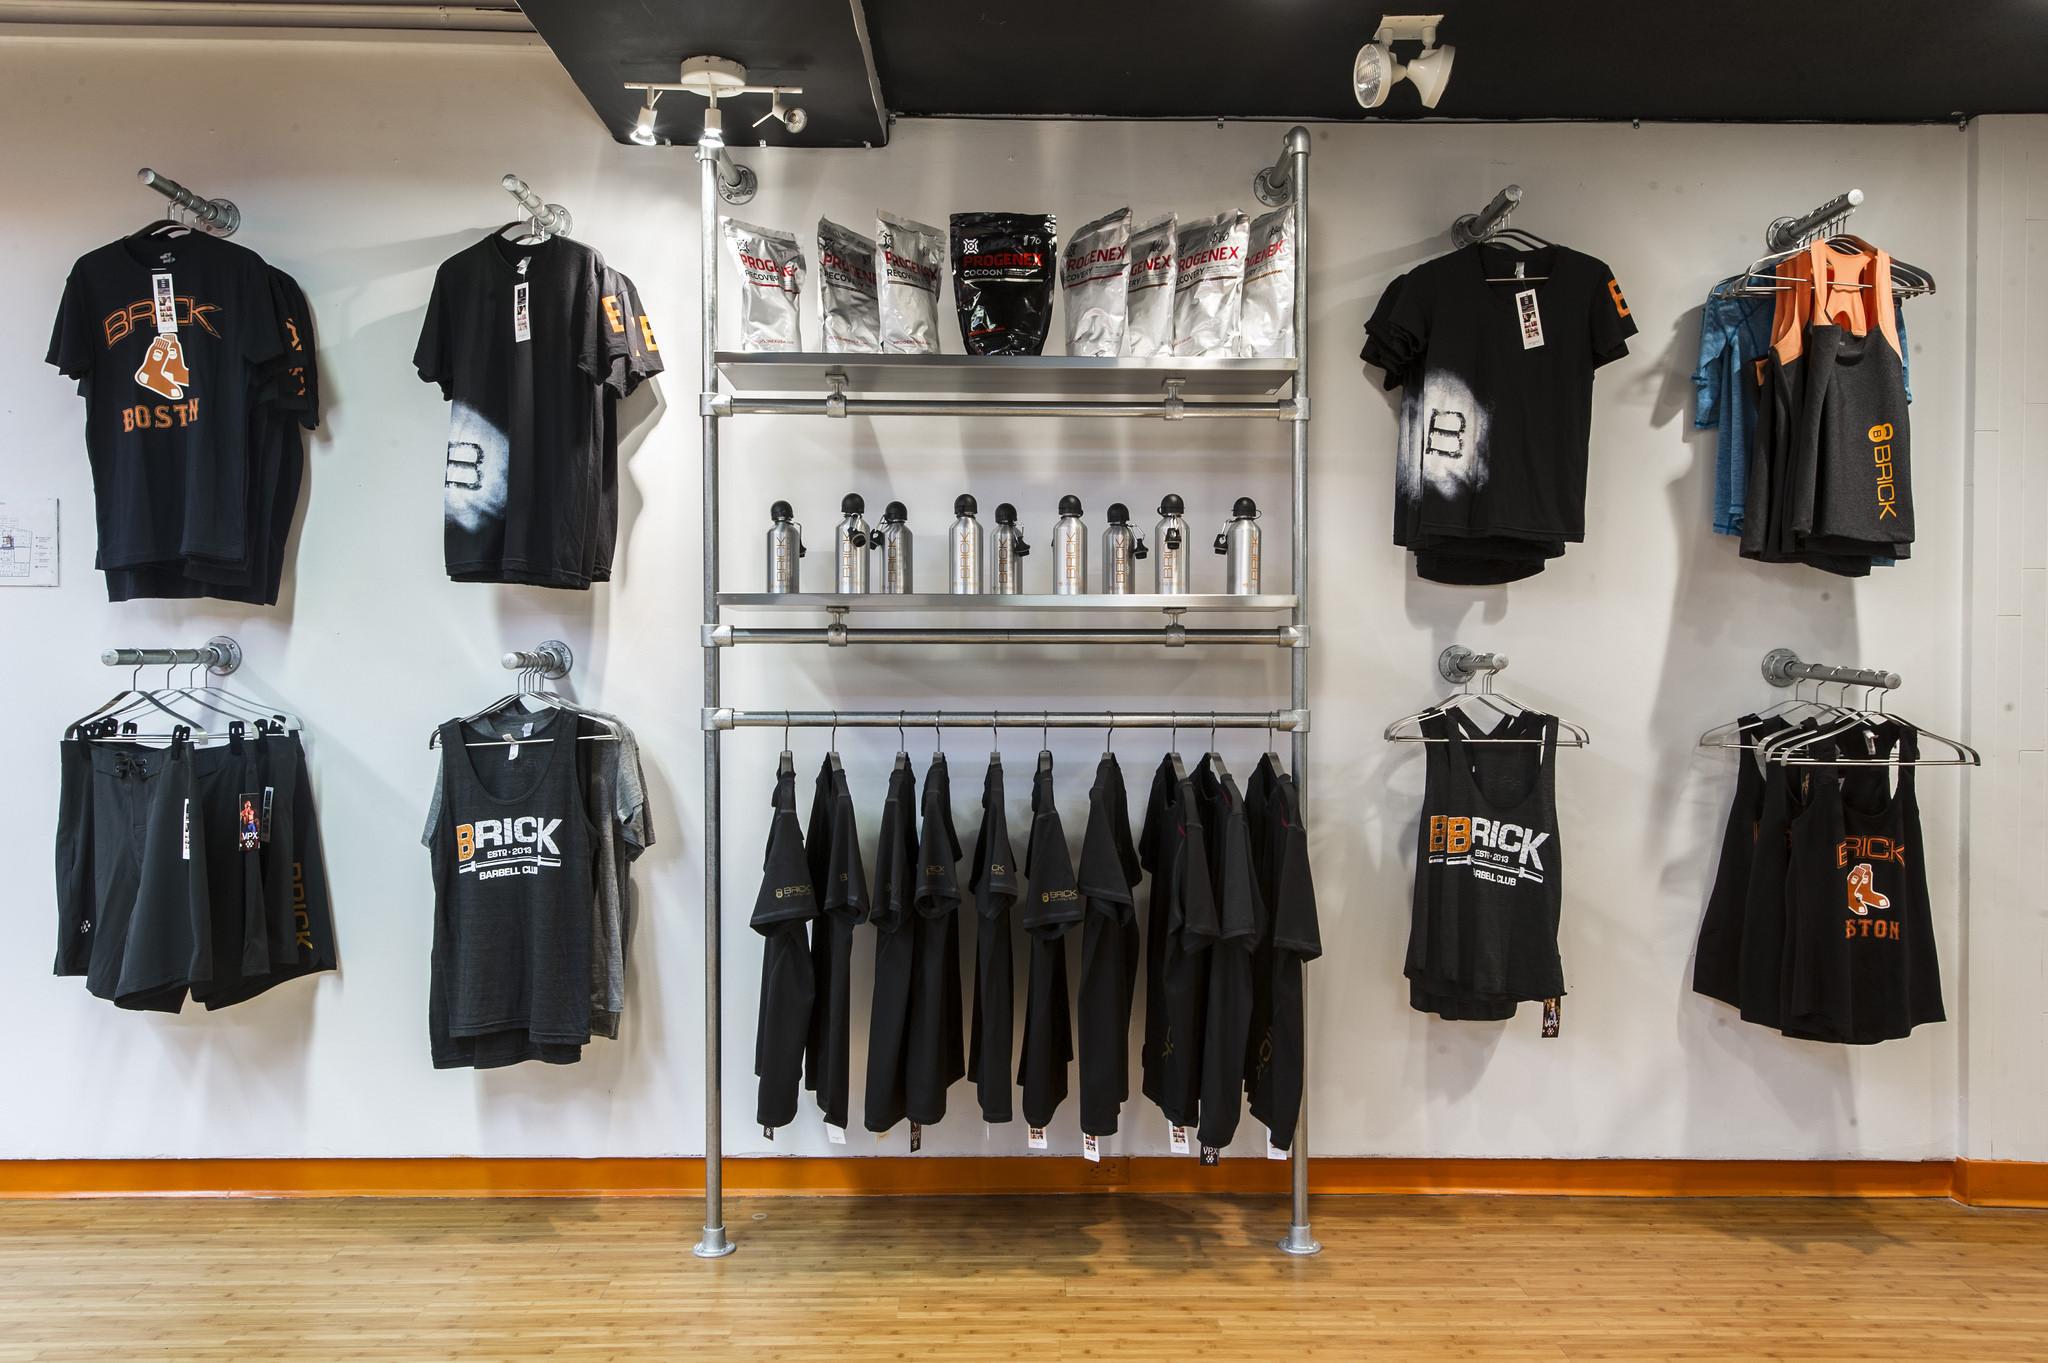 commercial grade clothing racks for